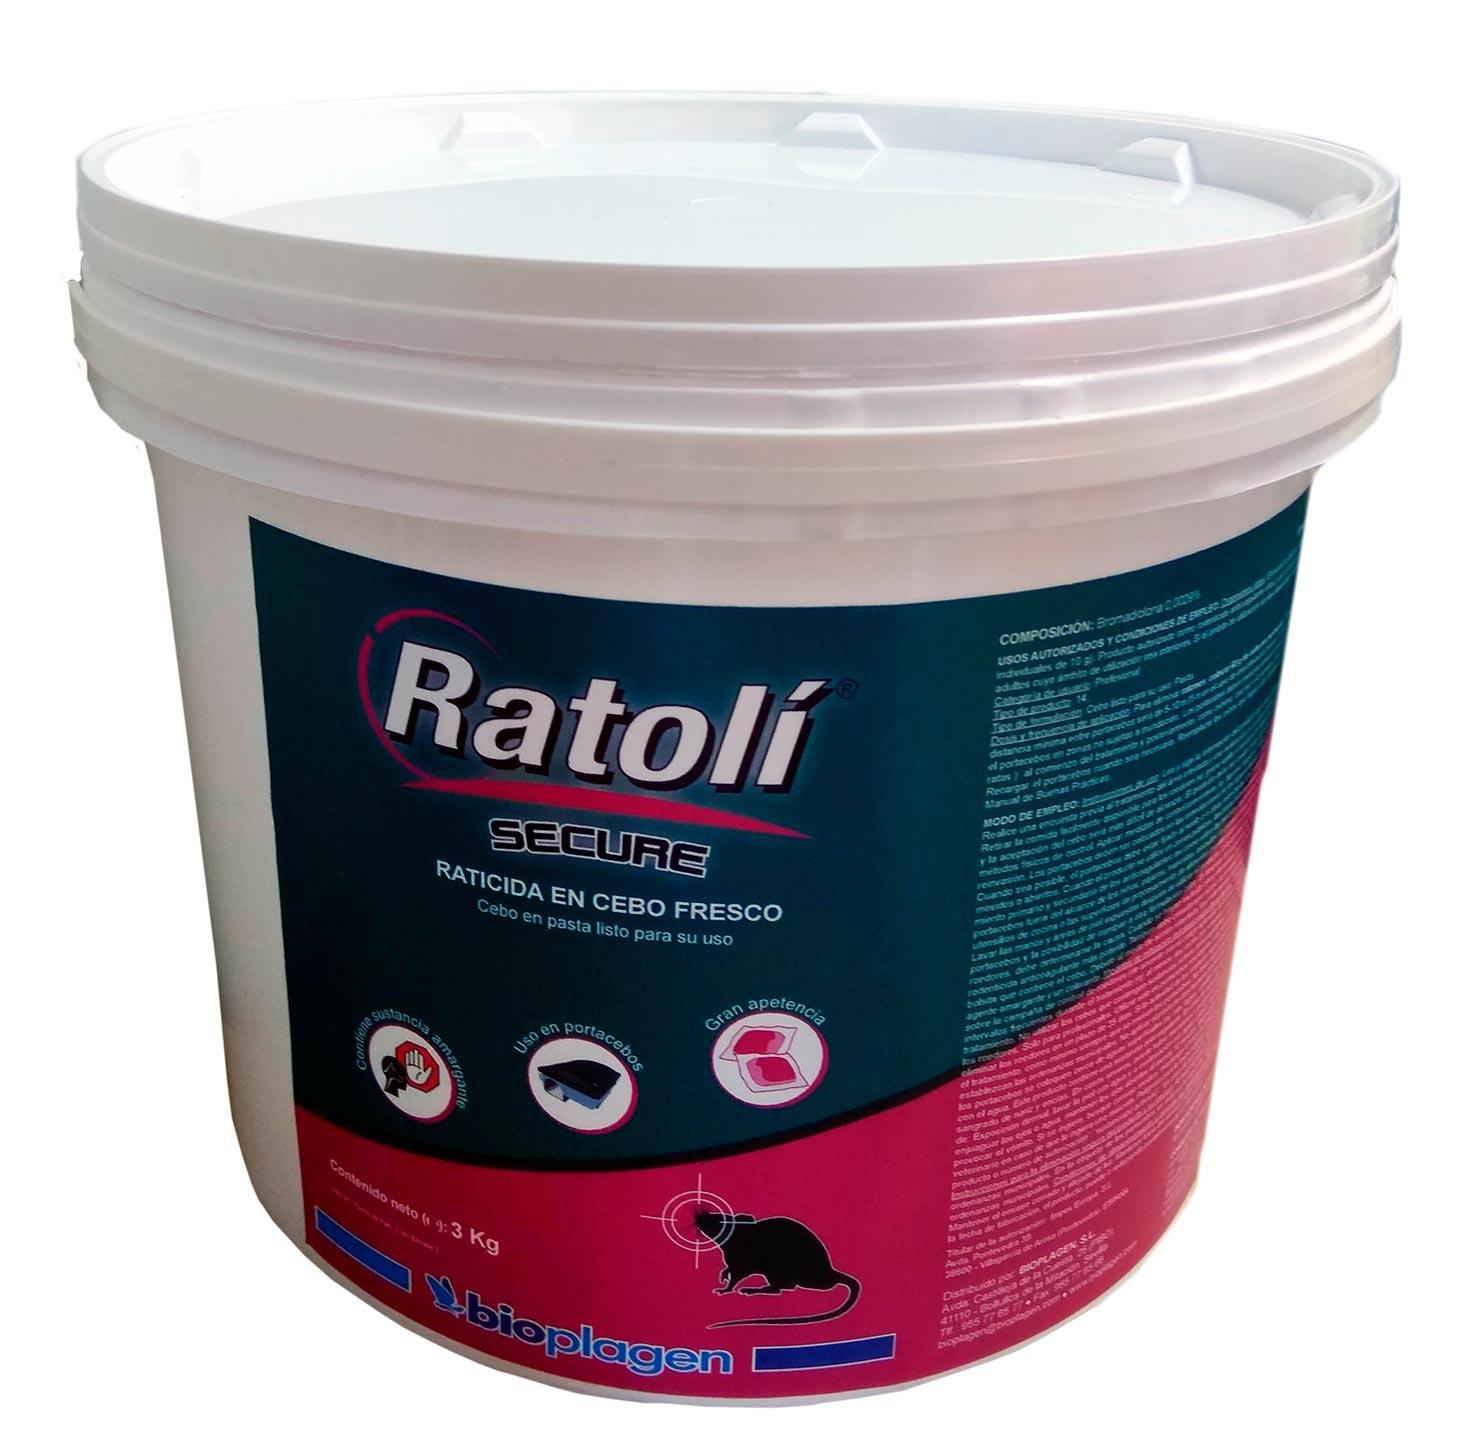 RATOLI SECURE CEBO FRESCO 3 KG ((RD))